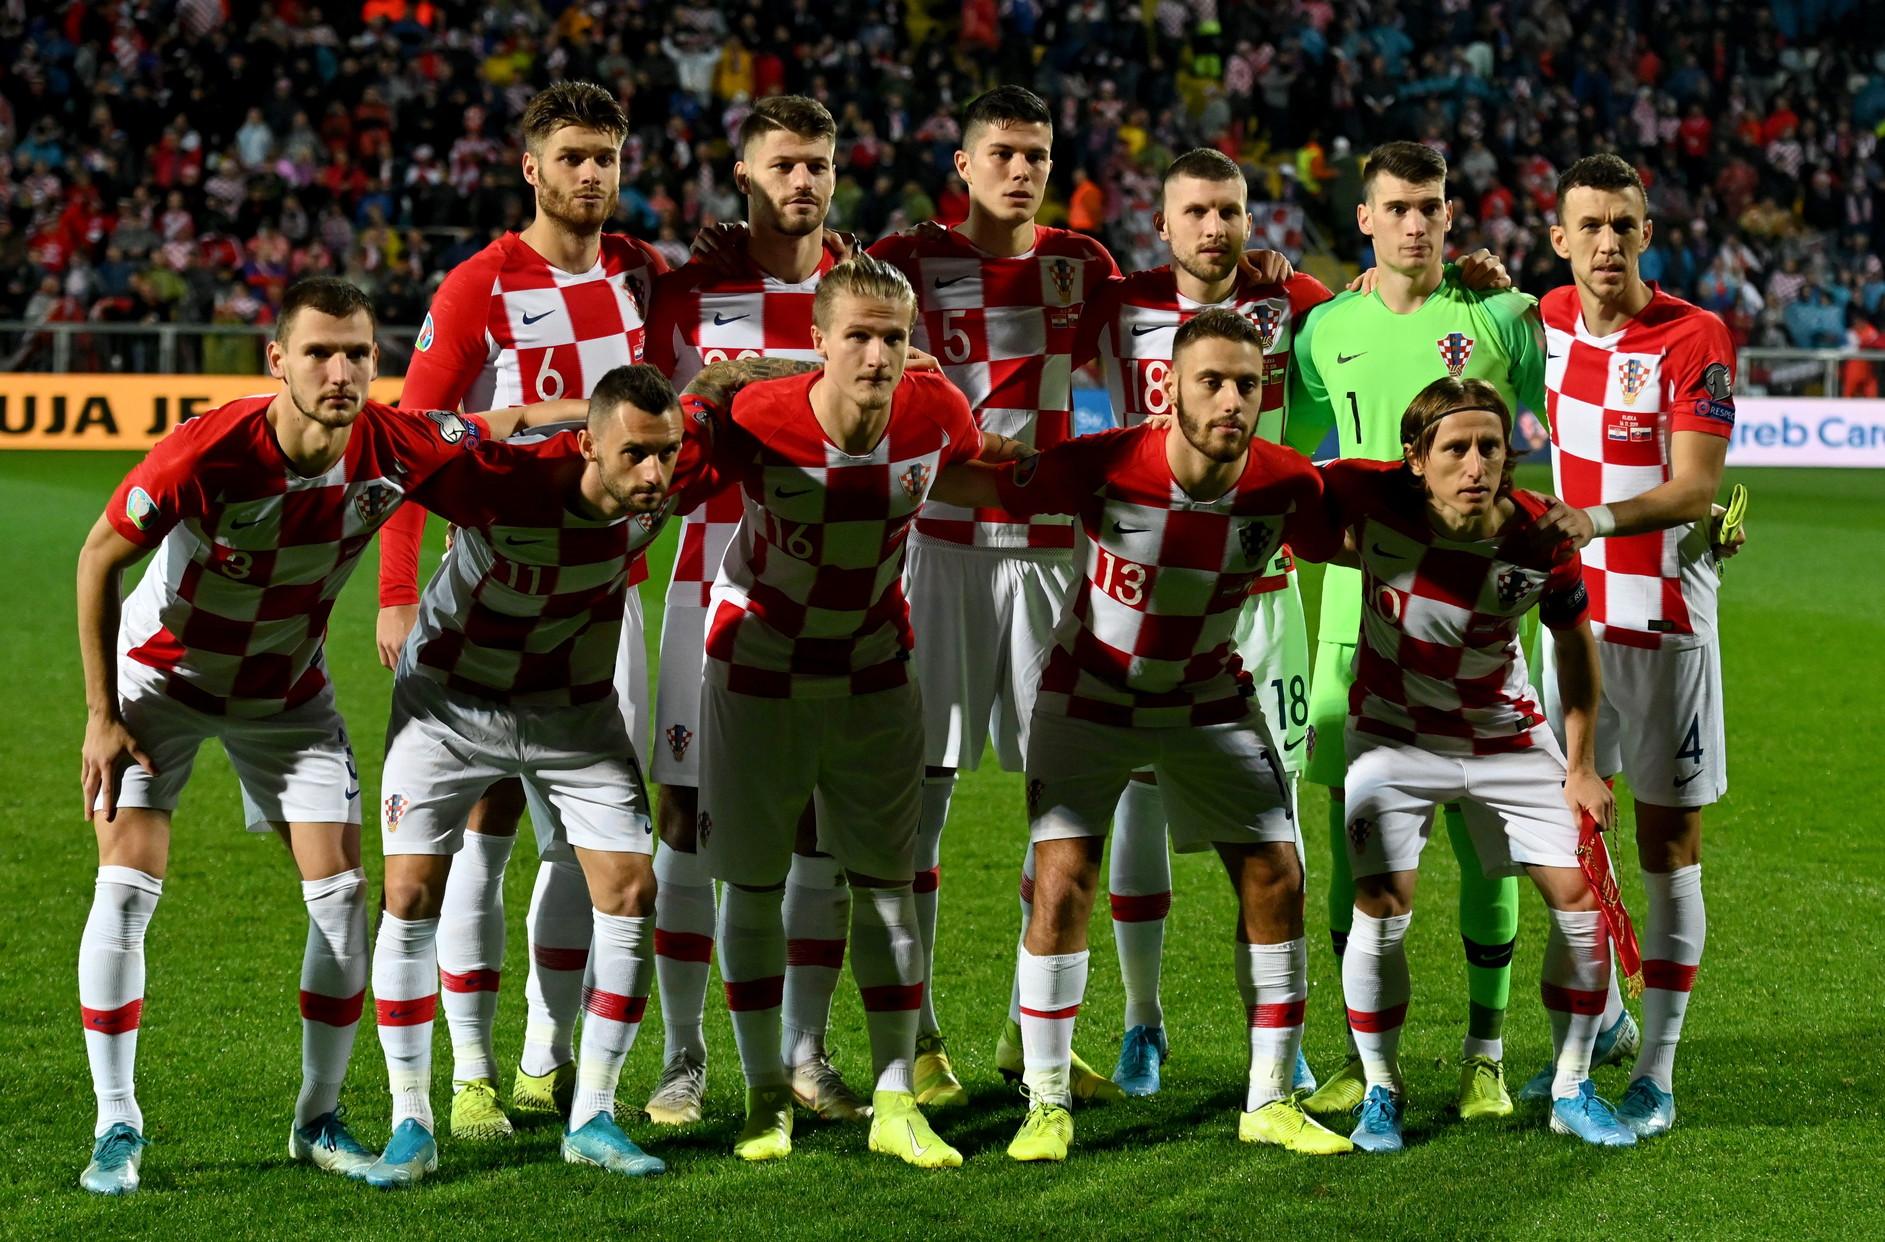 6) Croazia